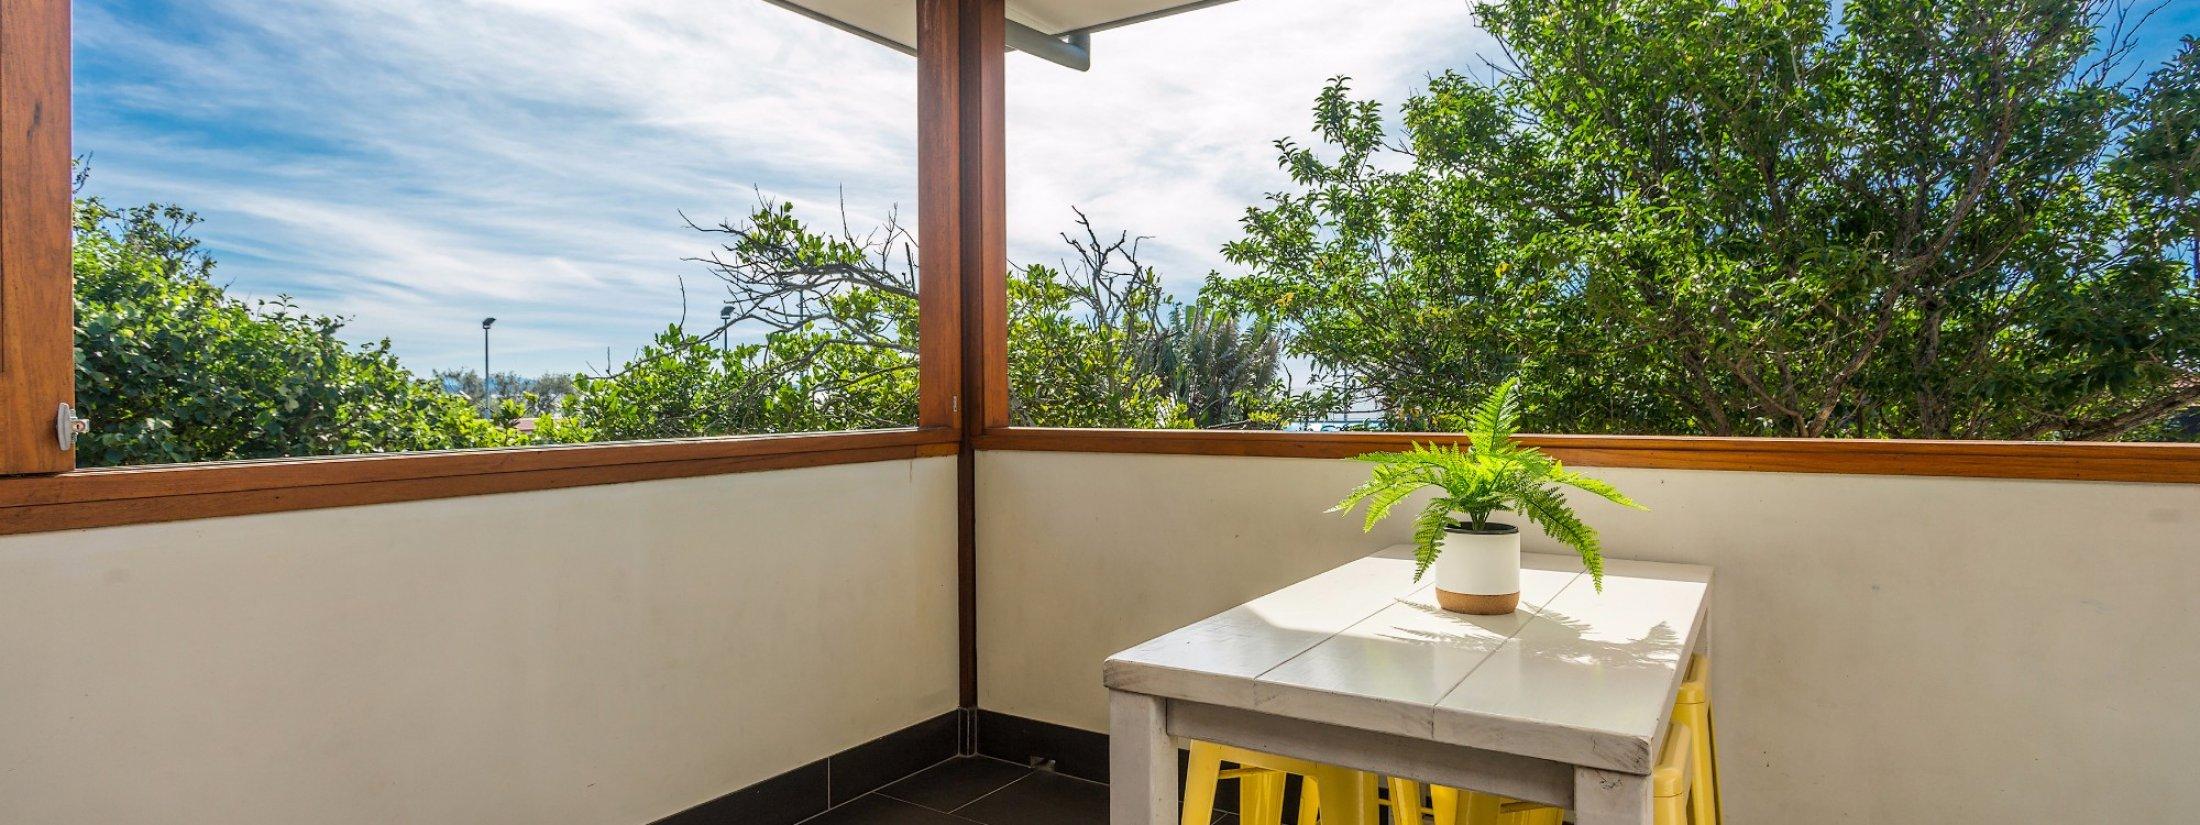 Quiksilver Apartments - The Wreck - outdoor patio